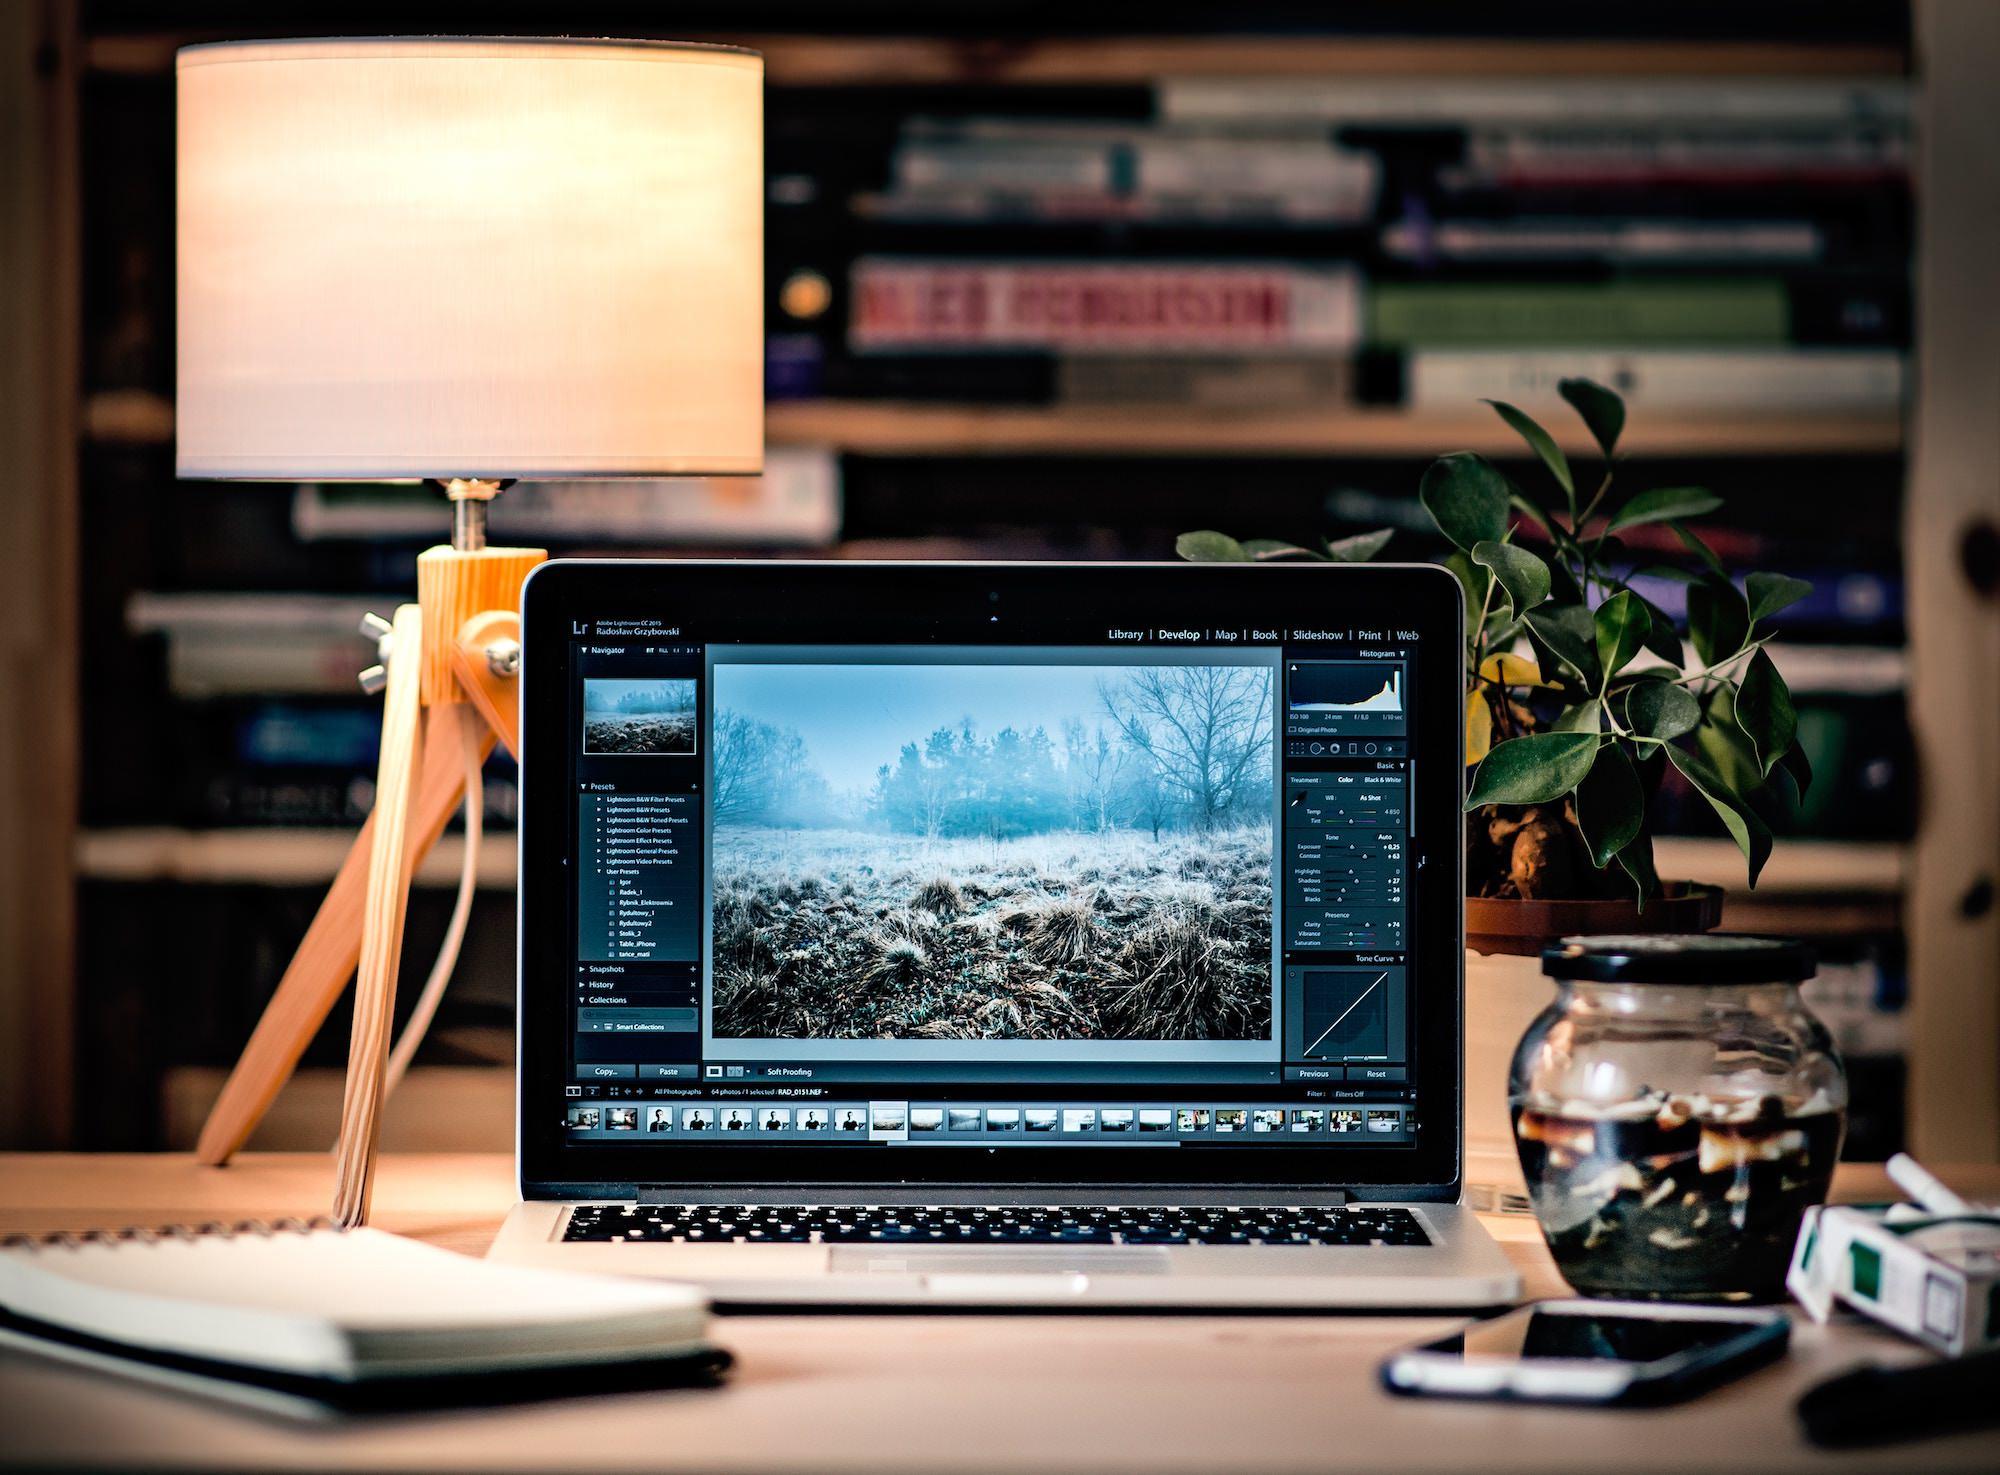 radek-grzybowski-macbook-pro-unsplash